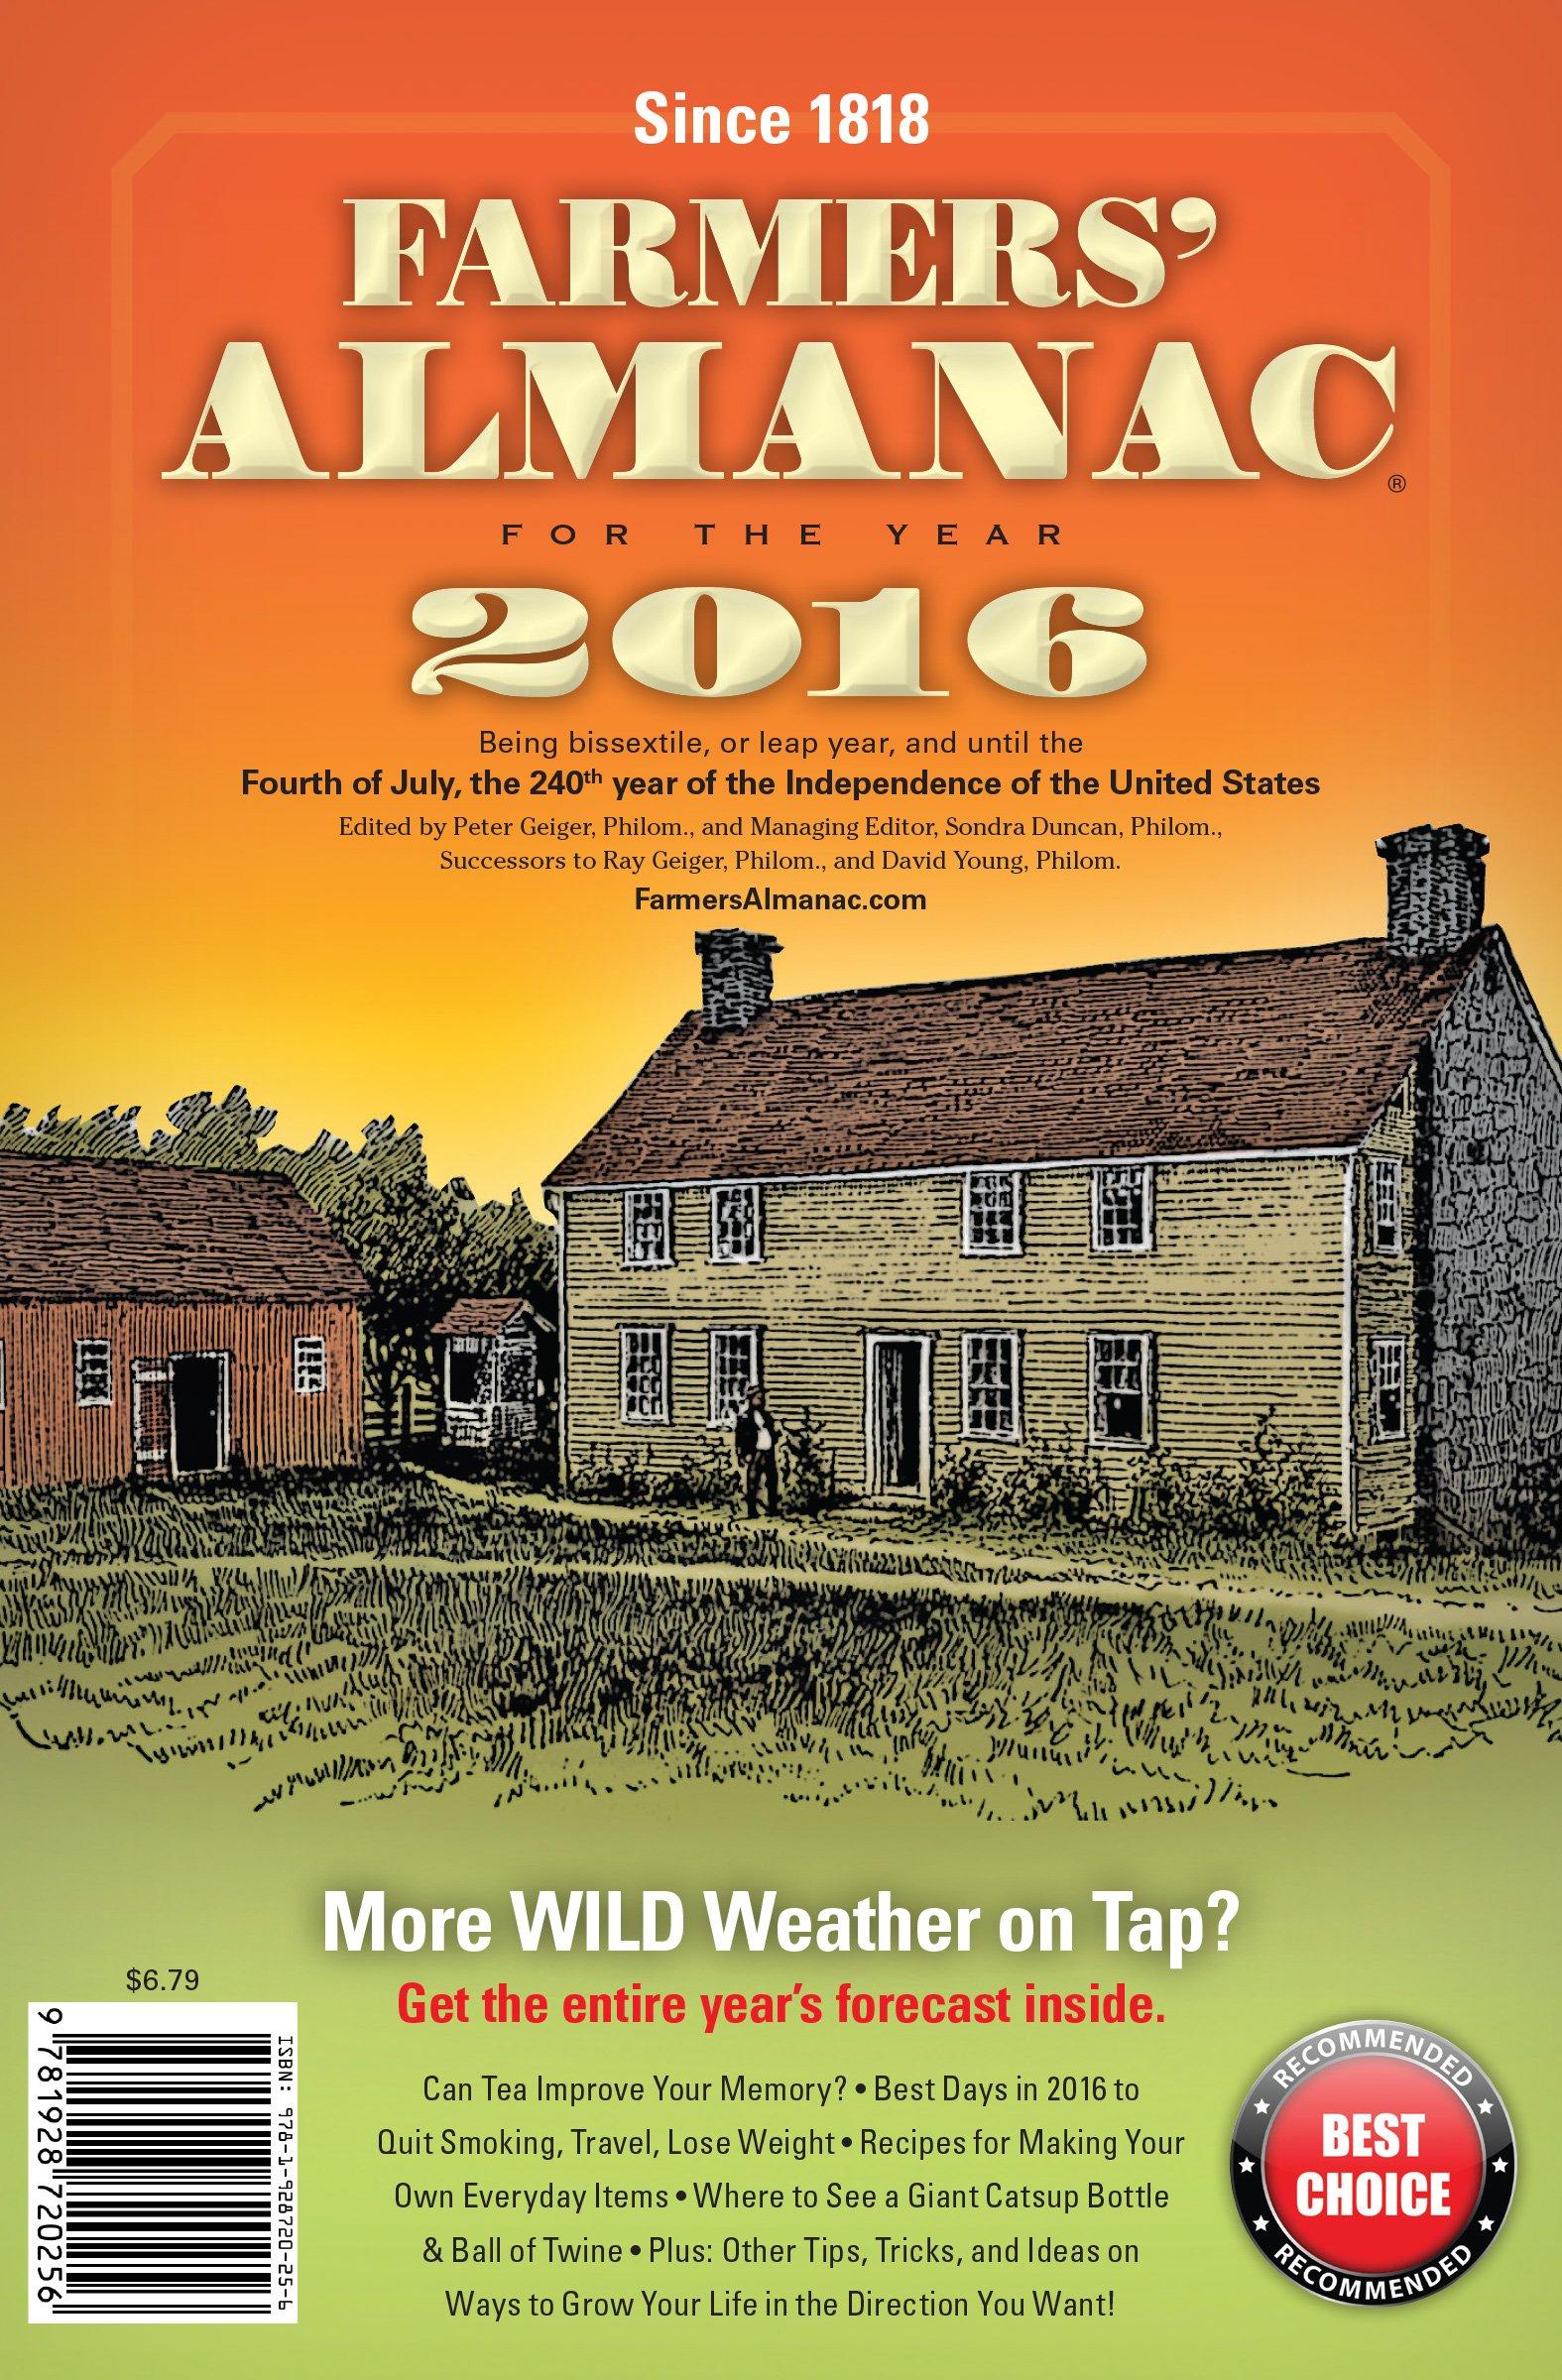 Top 28 farmers almanac weather should you listen to for Farmer s almanac 2017 winter forecast